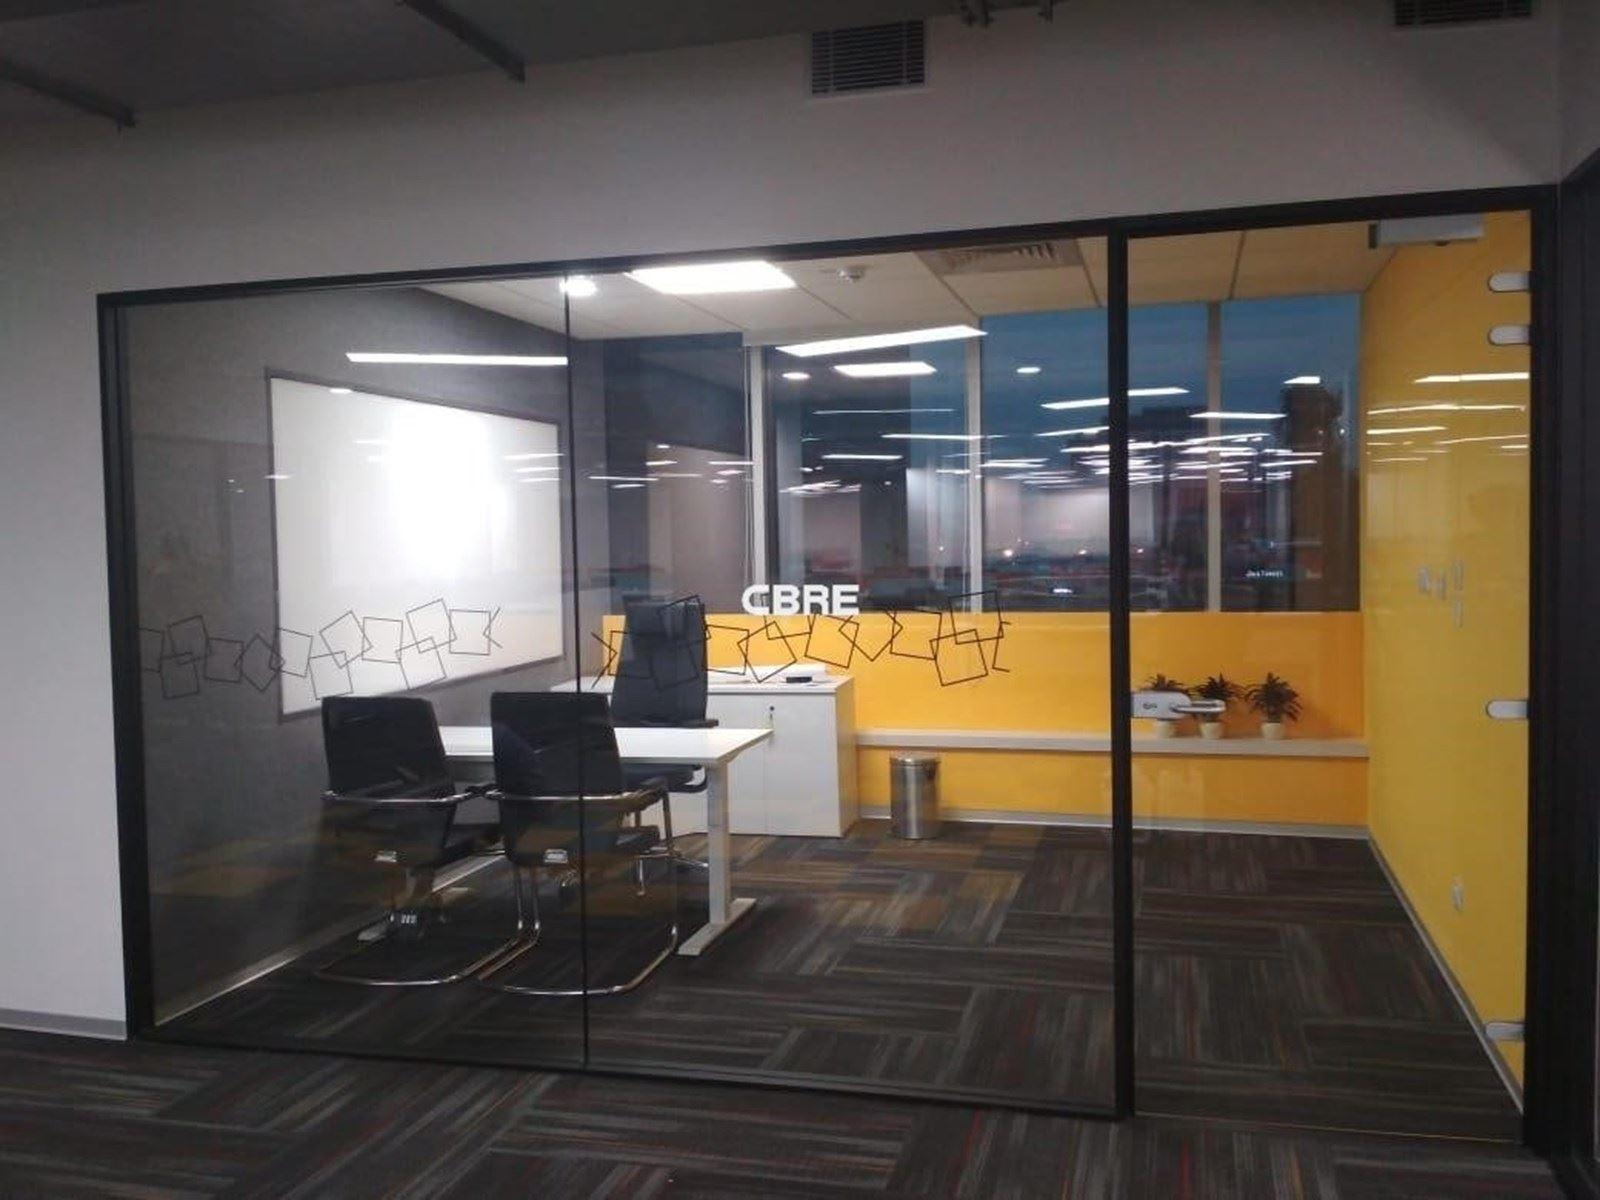 Flexible Office To Rent Indiqube Brigade Square Cambridge Rd Someshwarpura Halasuru 560008 Cbre Commercial